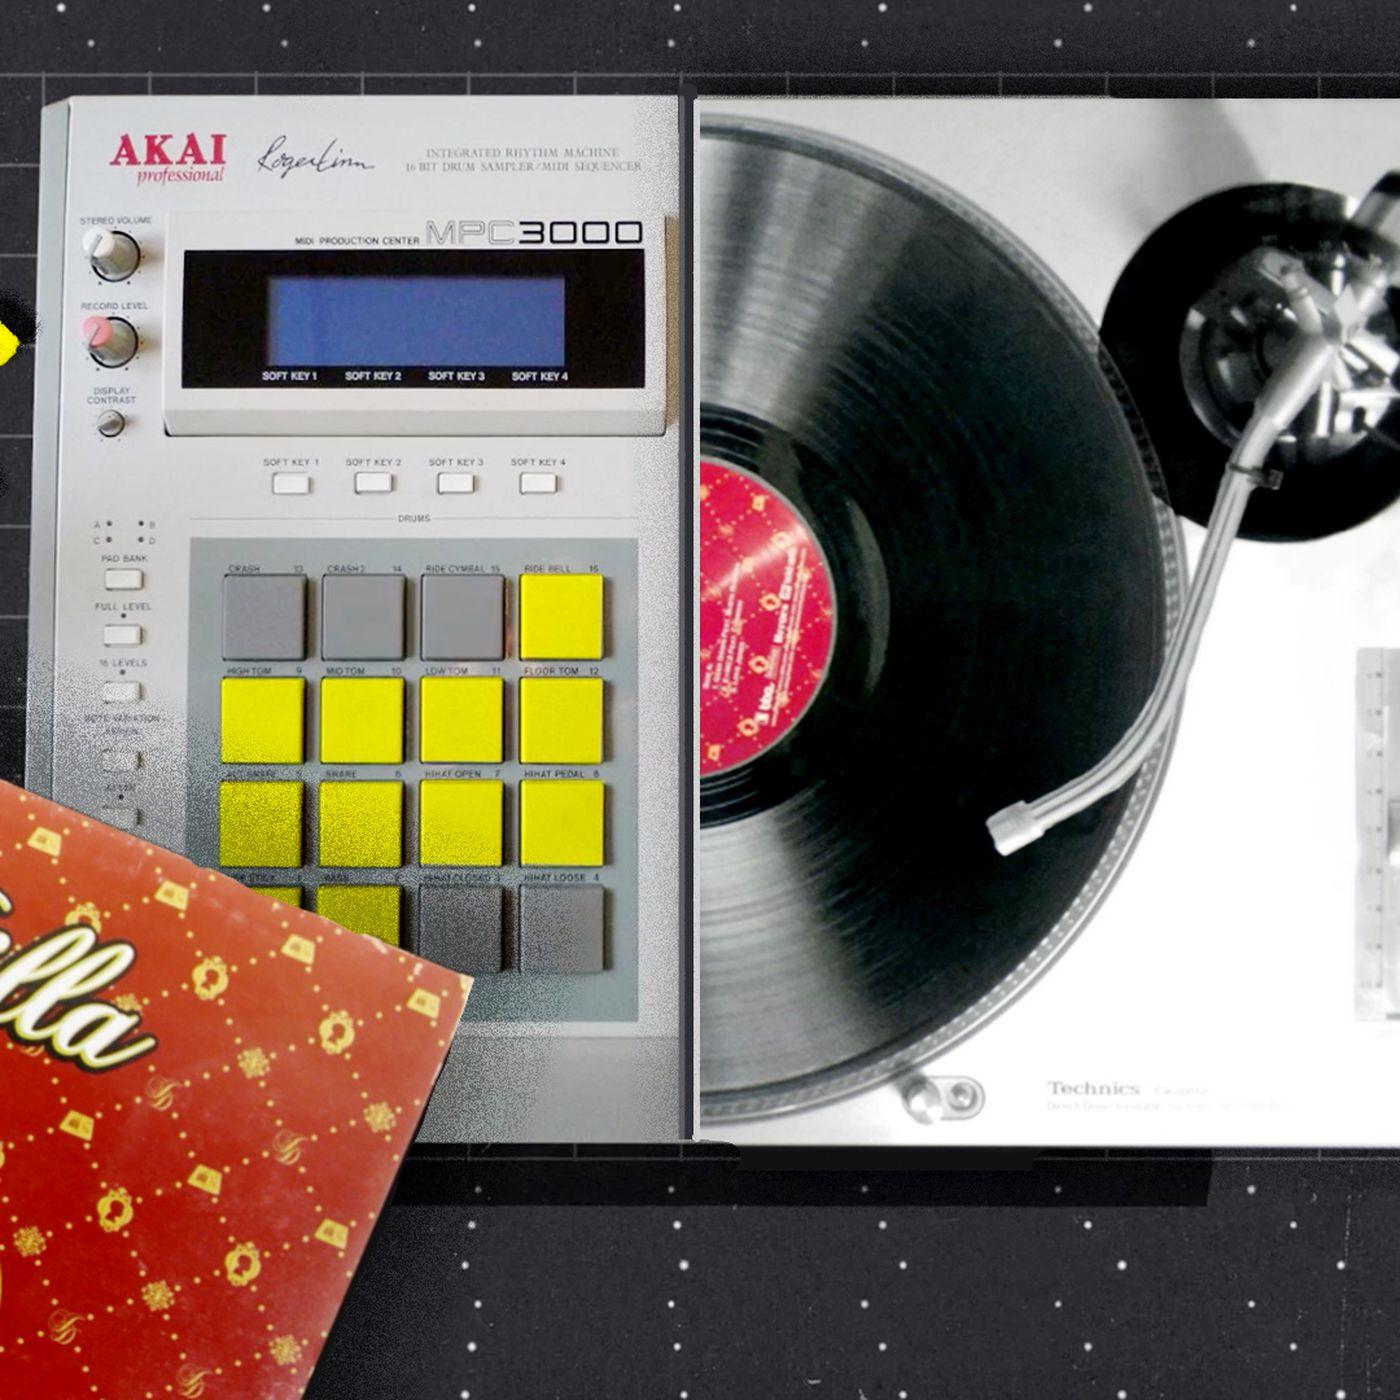 How this legendary hip-hop producer humanized a machine - Vox